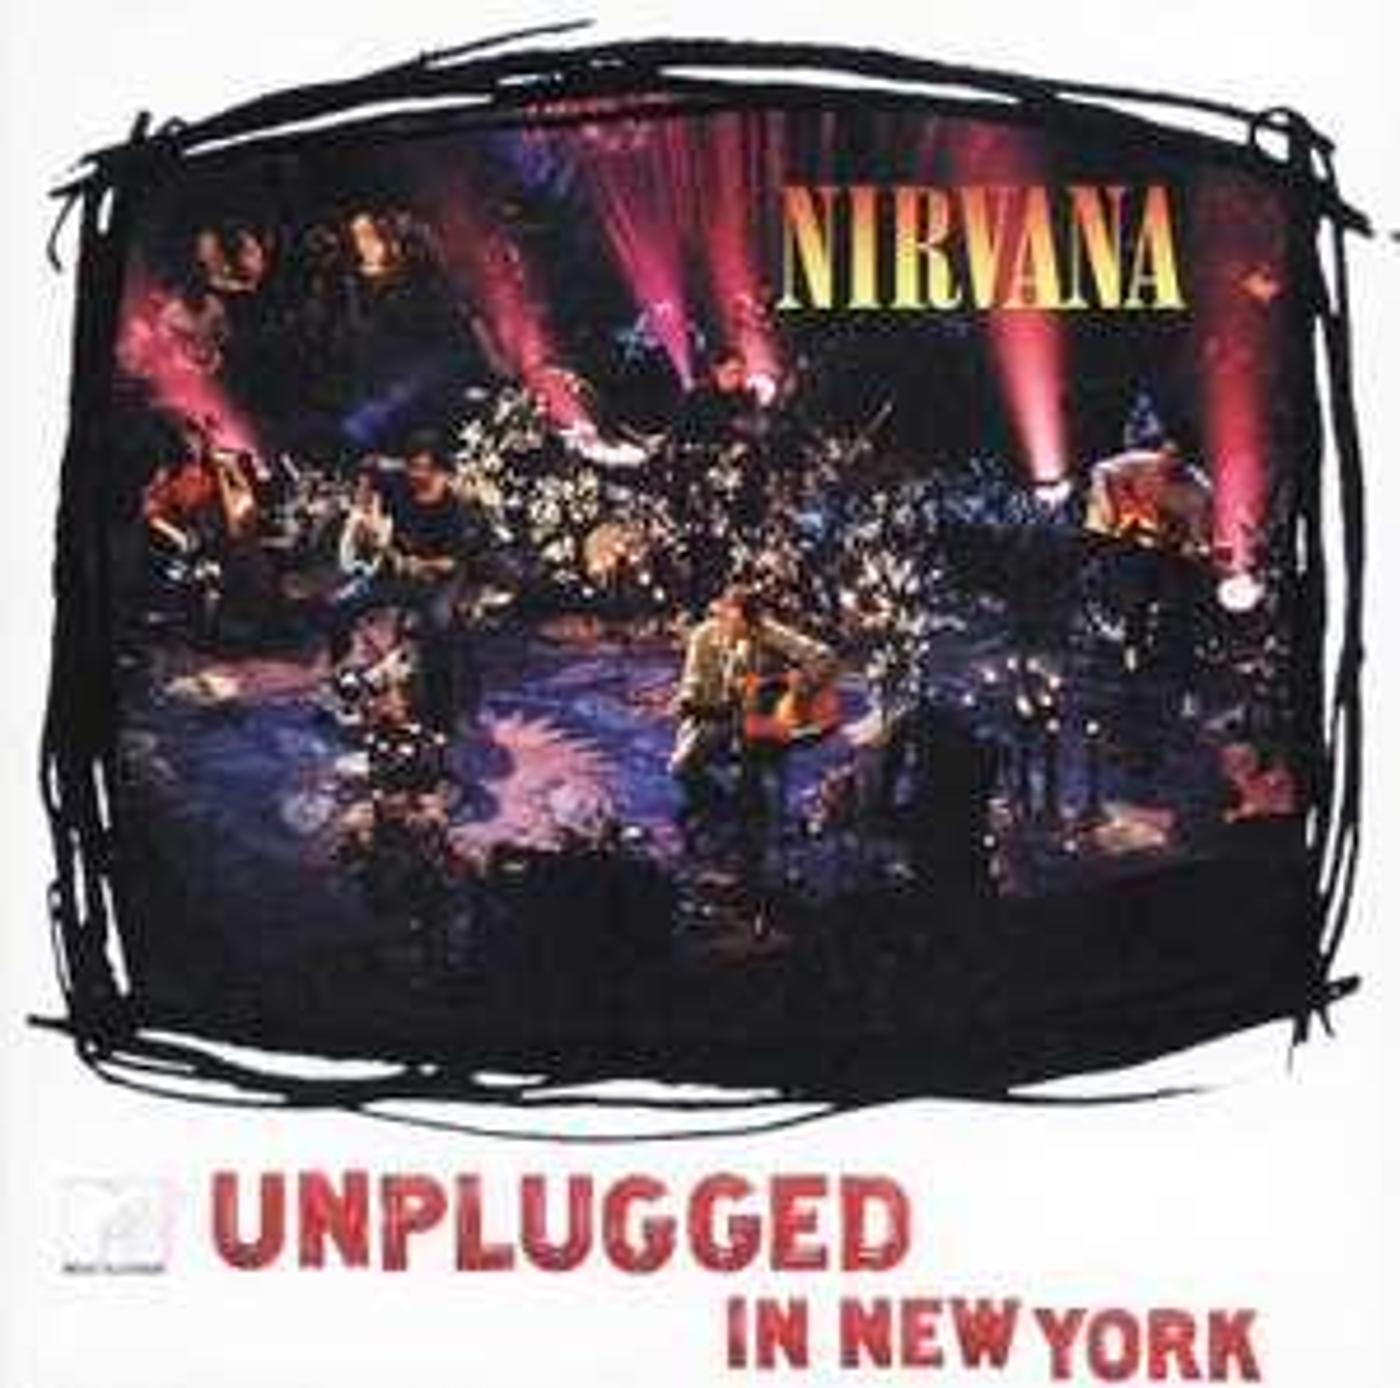 Nirvana - MTV Unplugged In New York (CD + Free MP3) £5.19 + £2.99 Non Prime @ Amazon